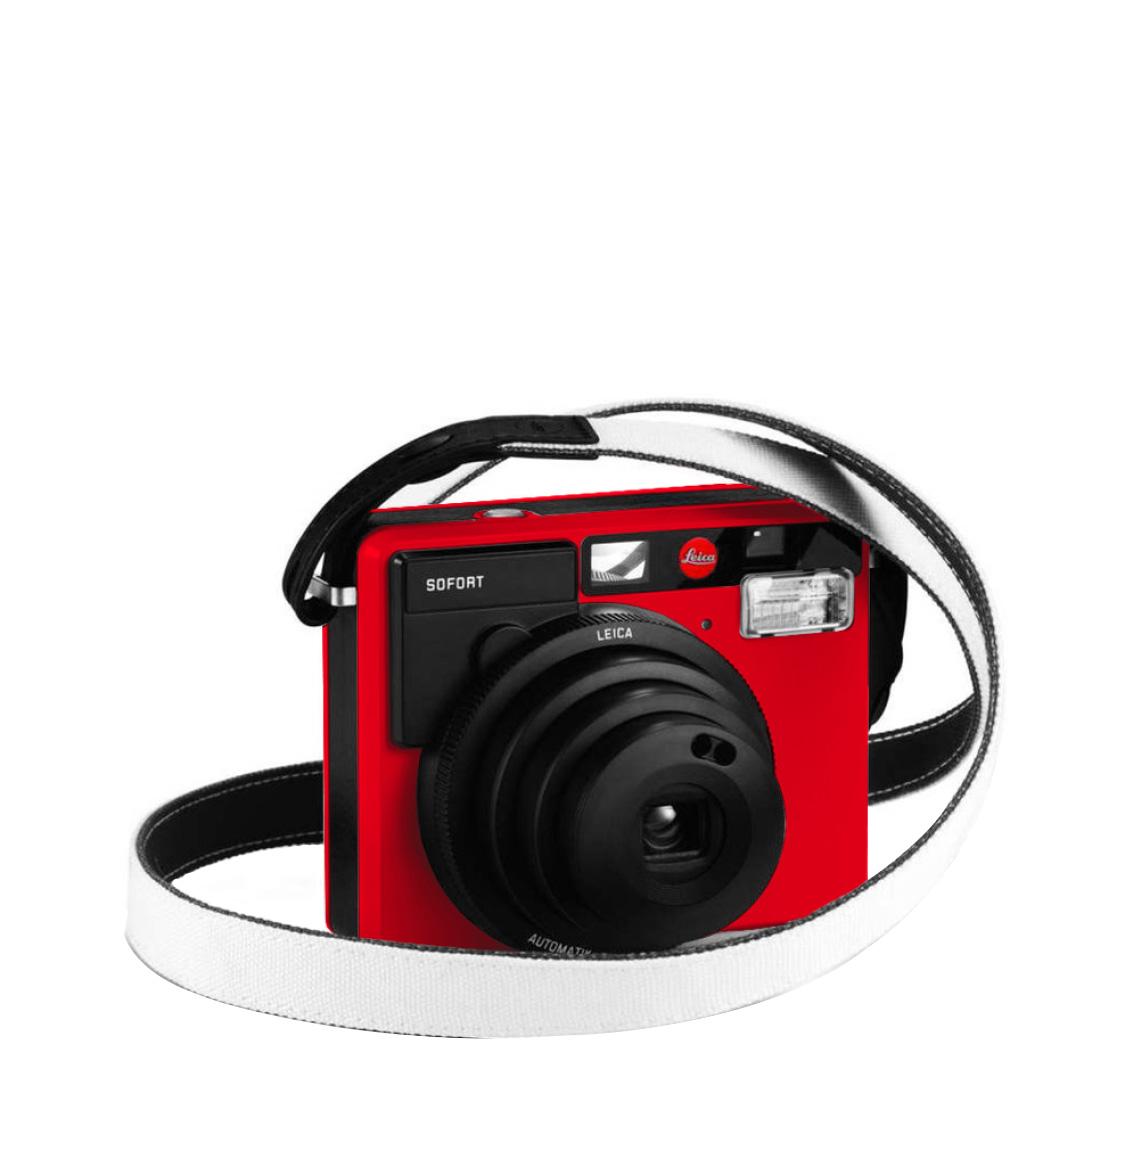 Leica Sofort Strap White